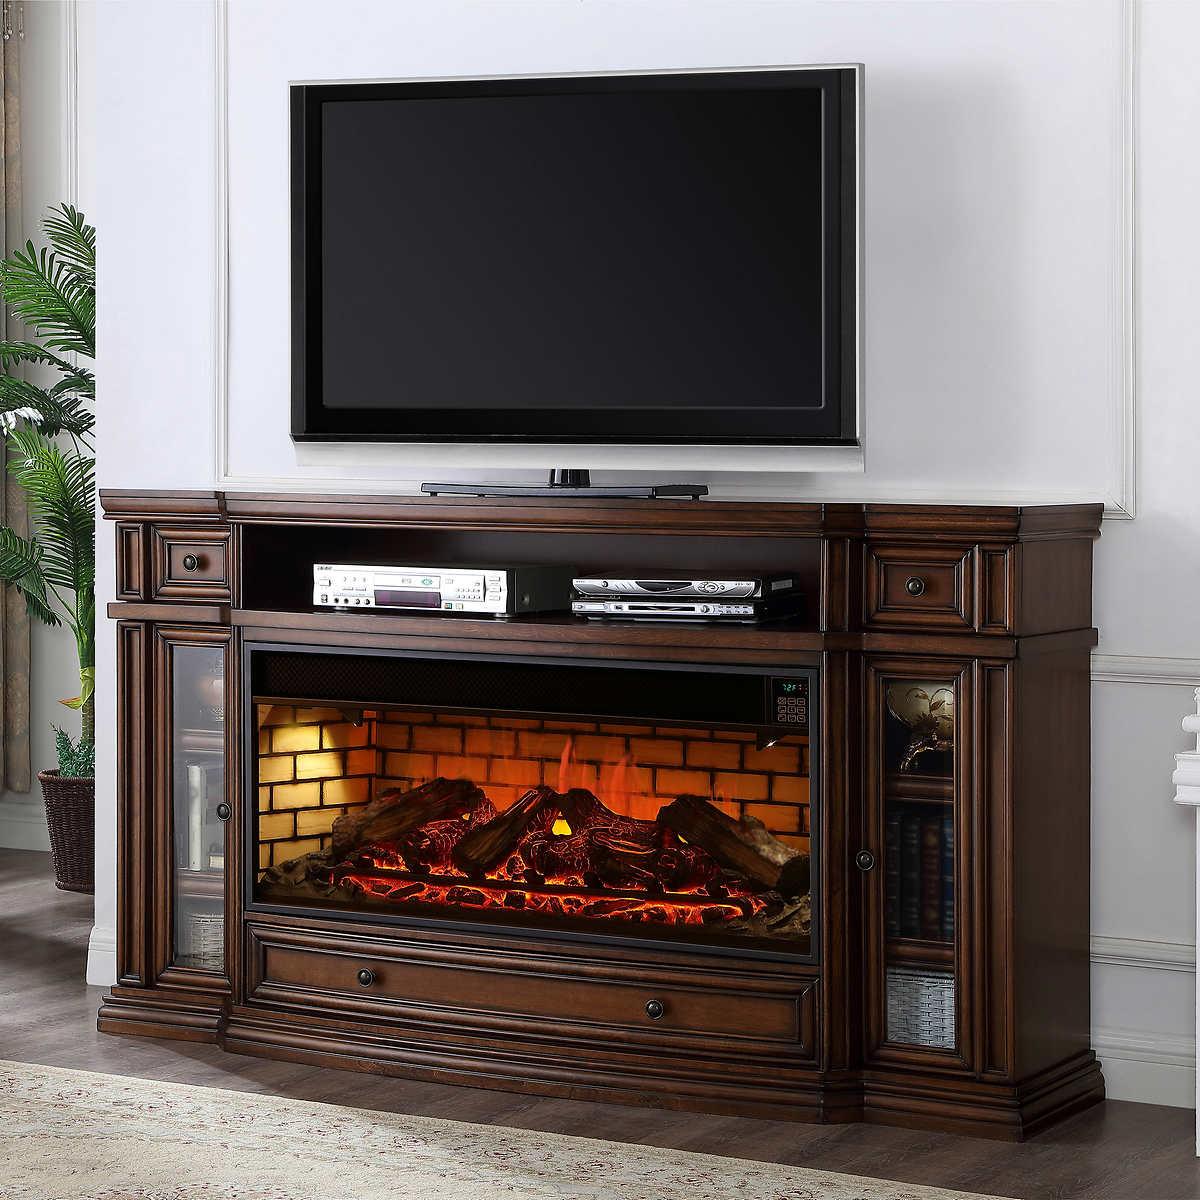 80 Inch Tv Stand With Fireplace Smartvradar Com